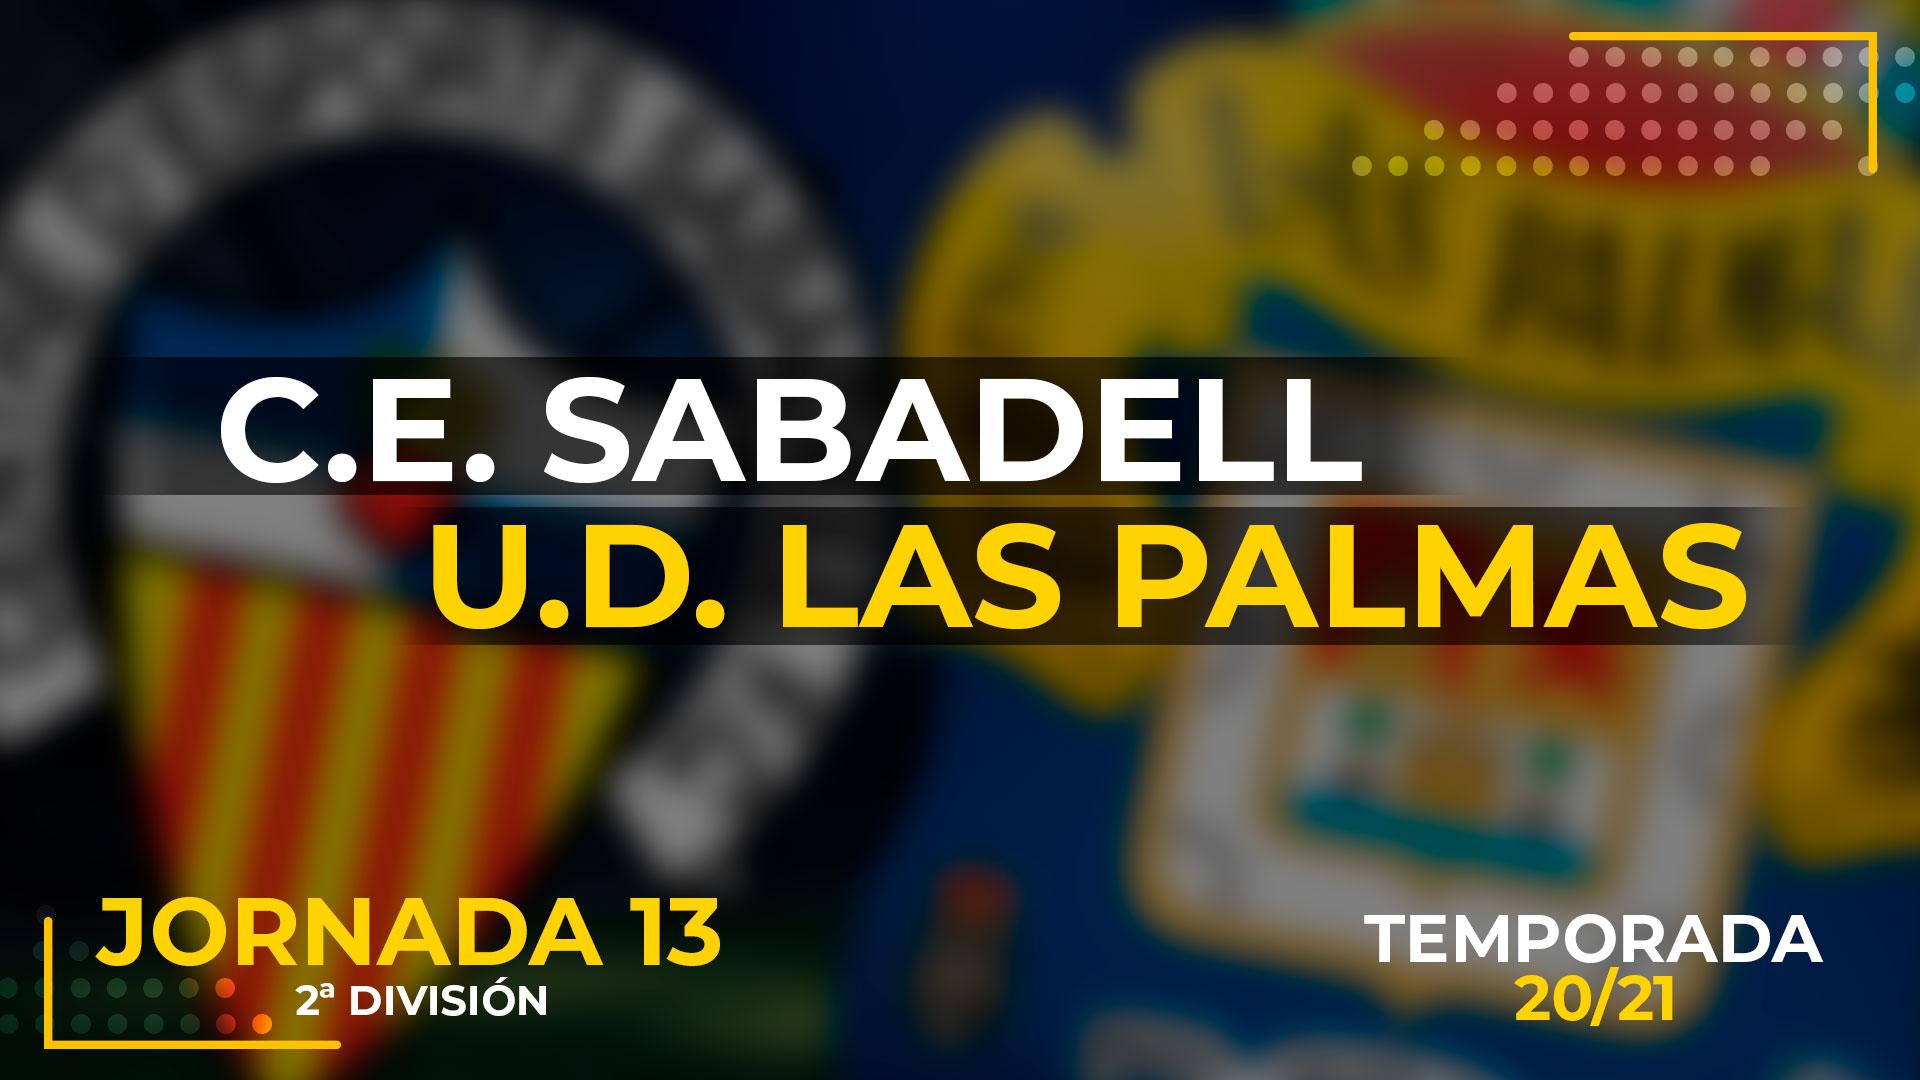 Sabadell vs UD Las Palmas